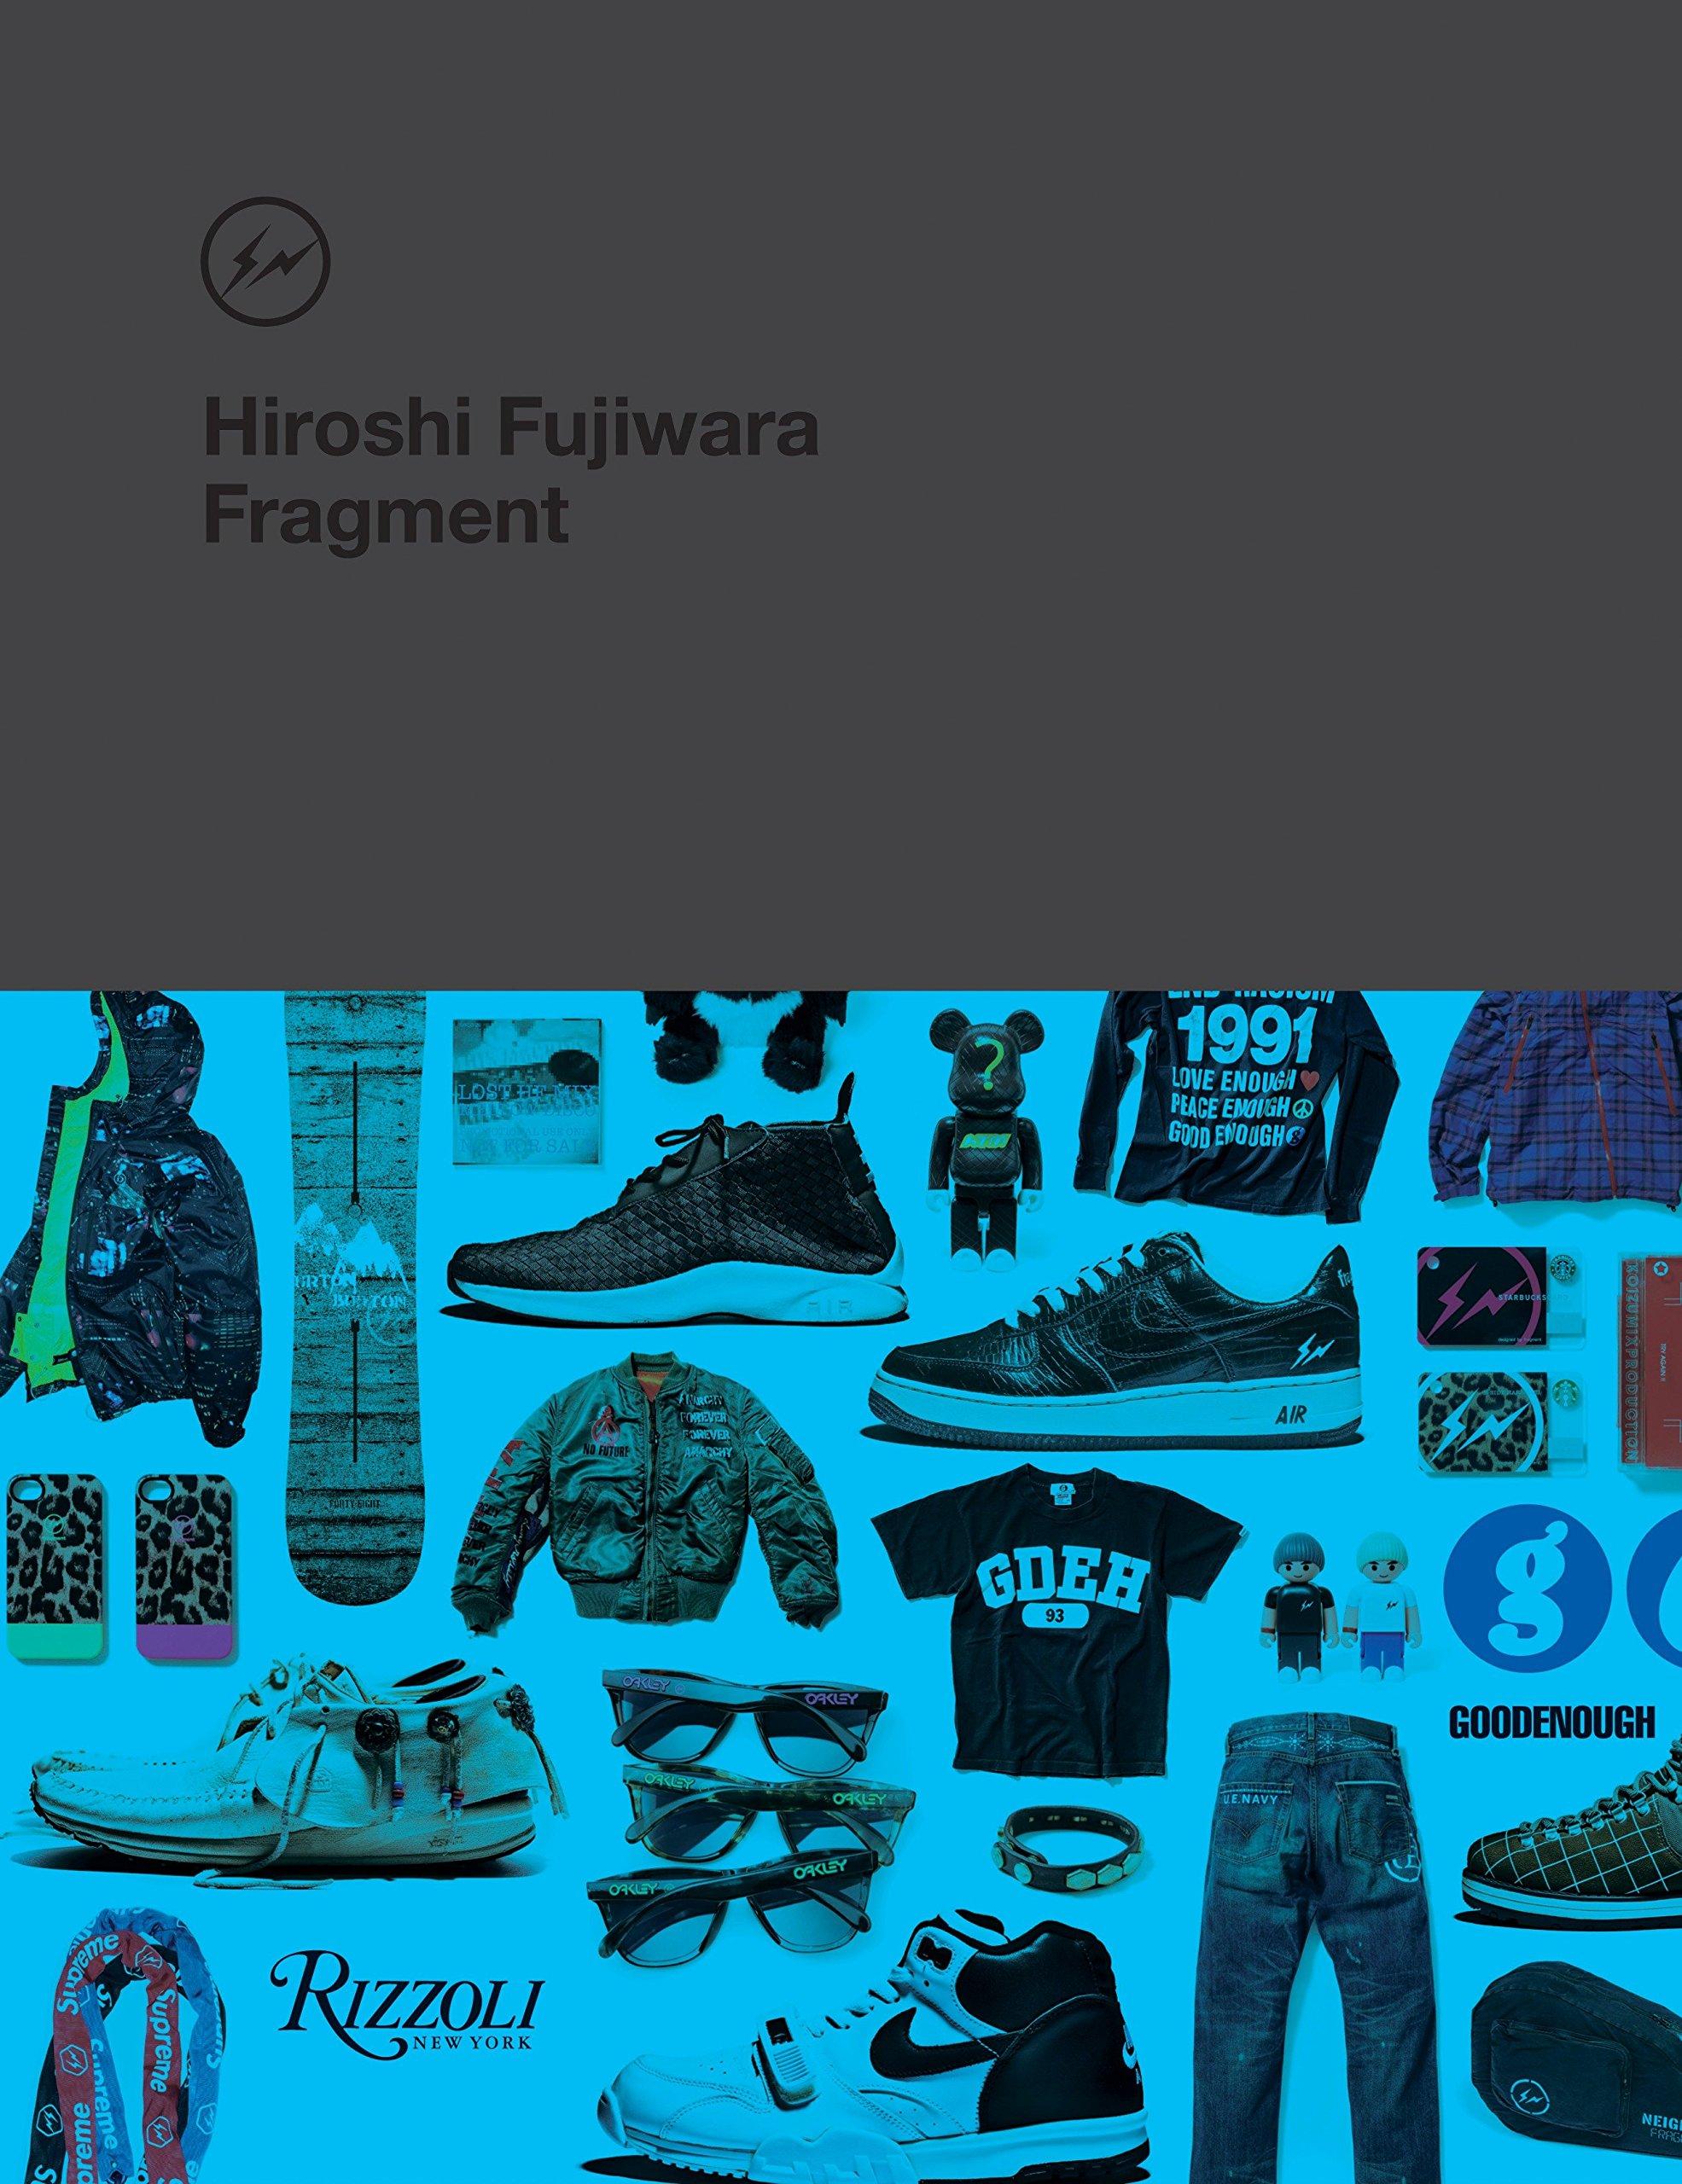 Hiroshi Fujiwara: Fragment by Rizzoli